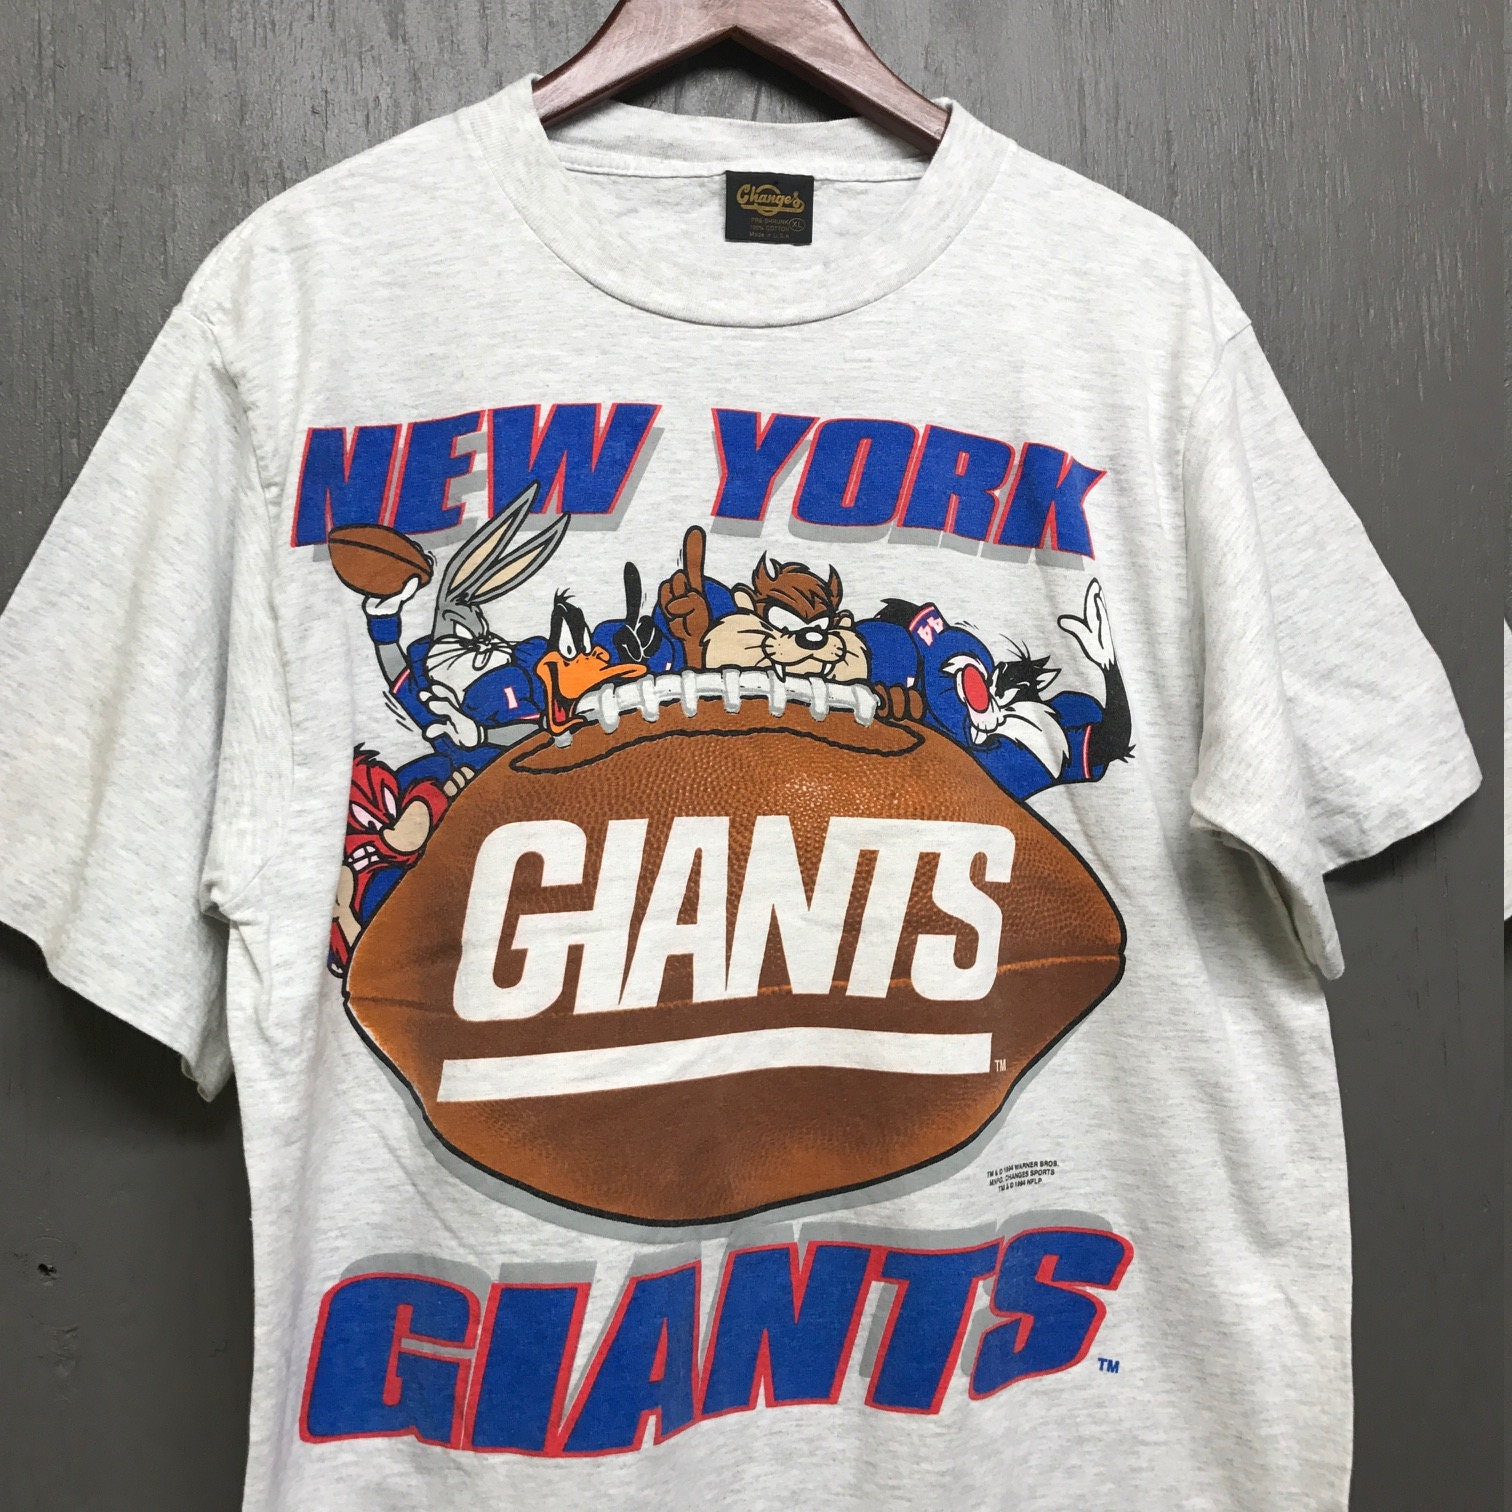 d246c9dc0 Vintage New York Giants T Shirts - BCD Tofu House